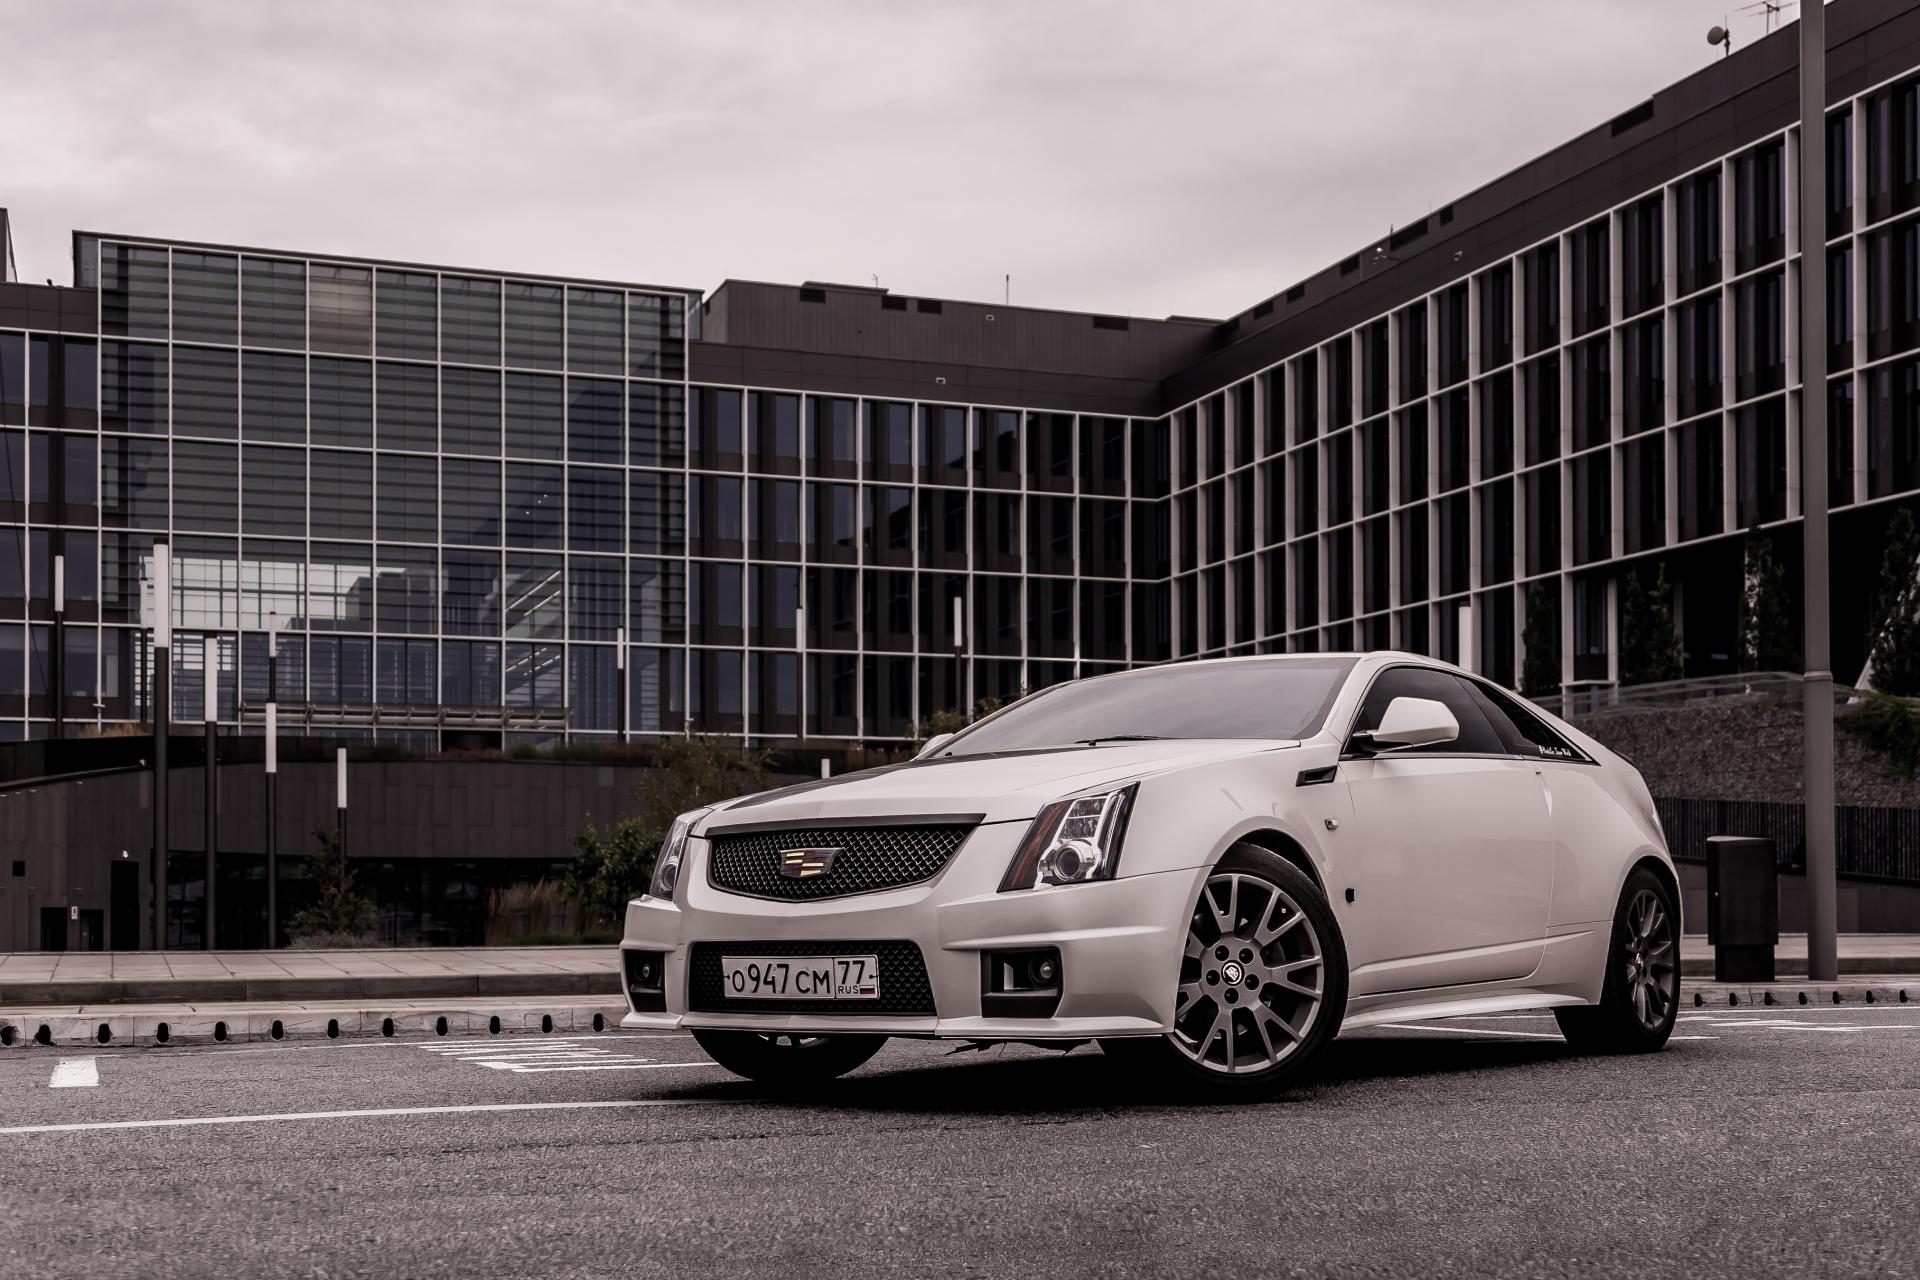 General Motor: Cadillac wird erstes E-Auto auf neu geschaffener E-Auto-Plattform